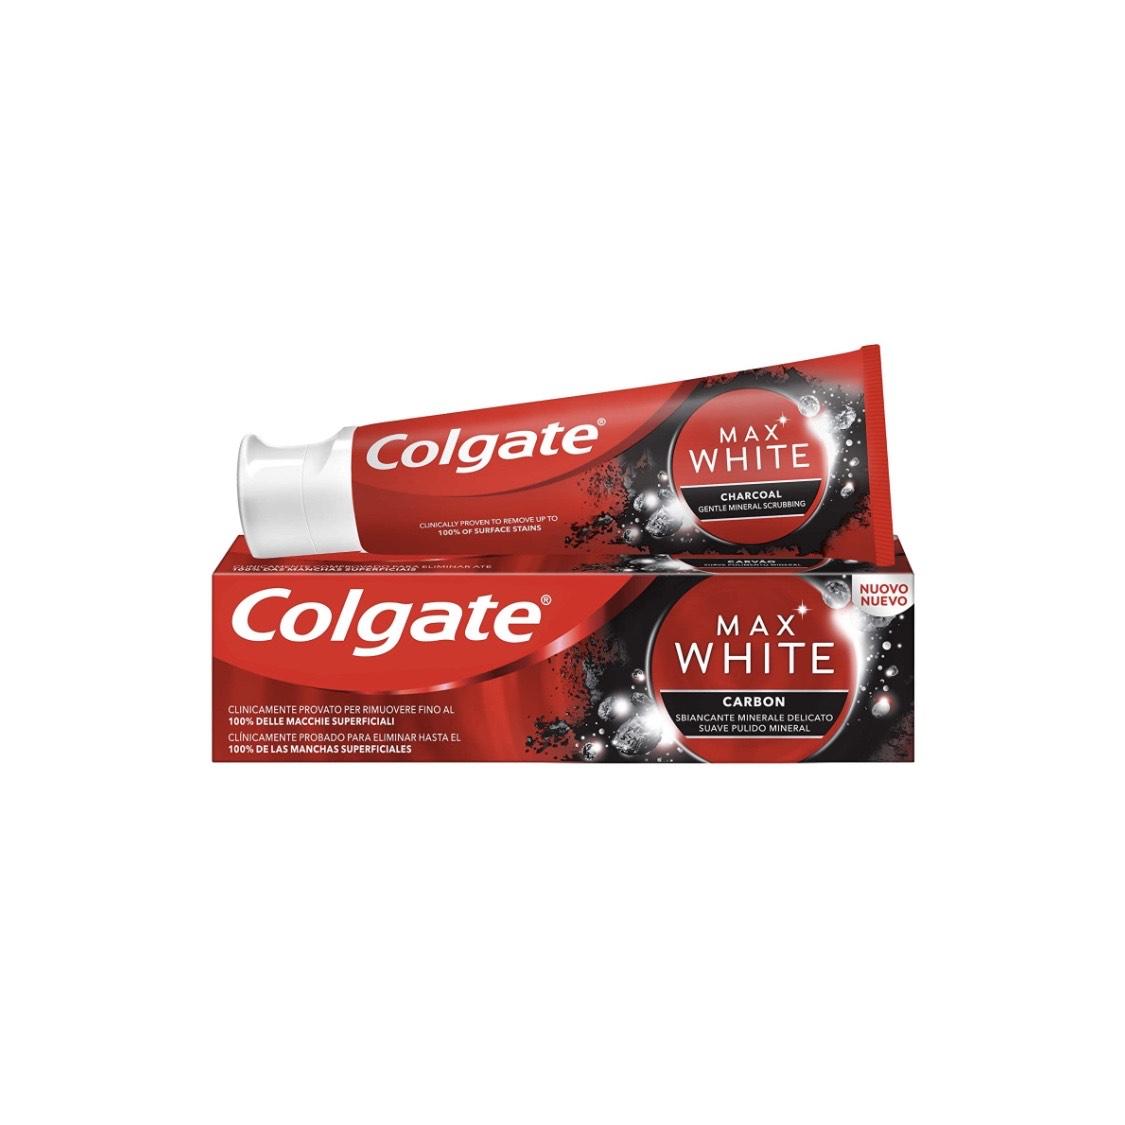 Colgate Max White Carbon | -0,68€ al Tramitar + Compra Recurrente